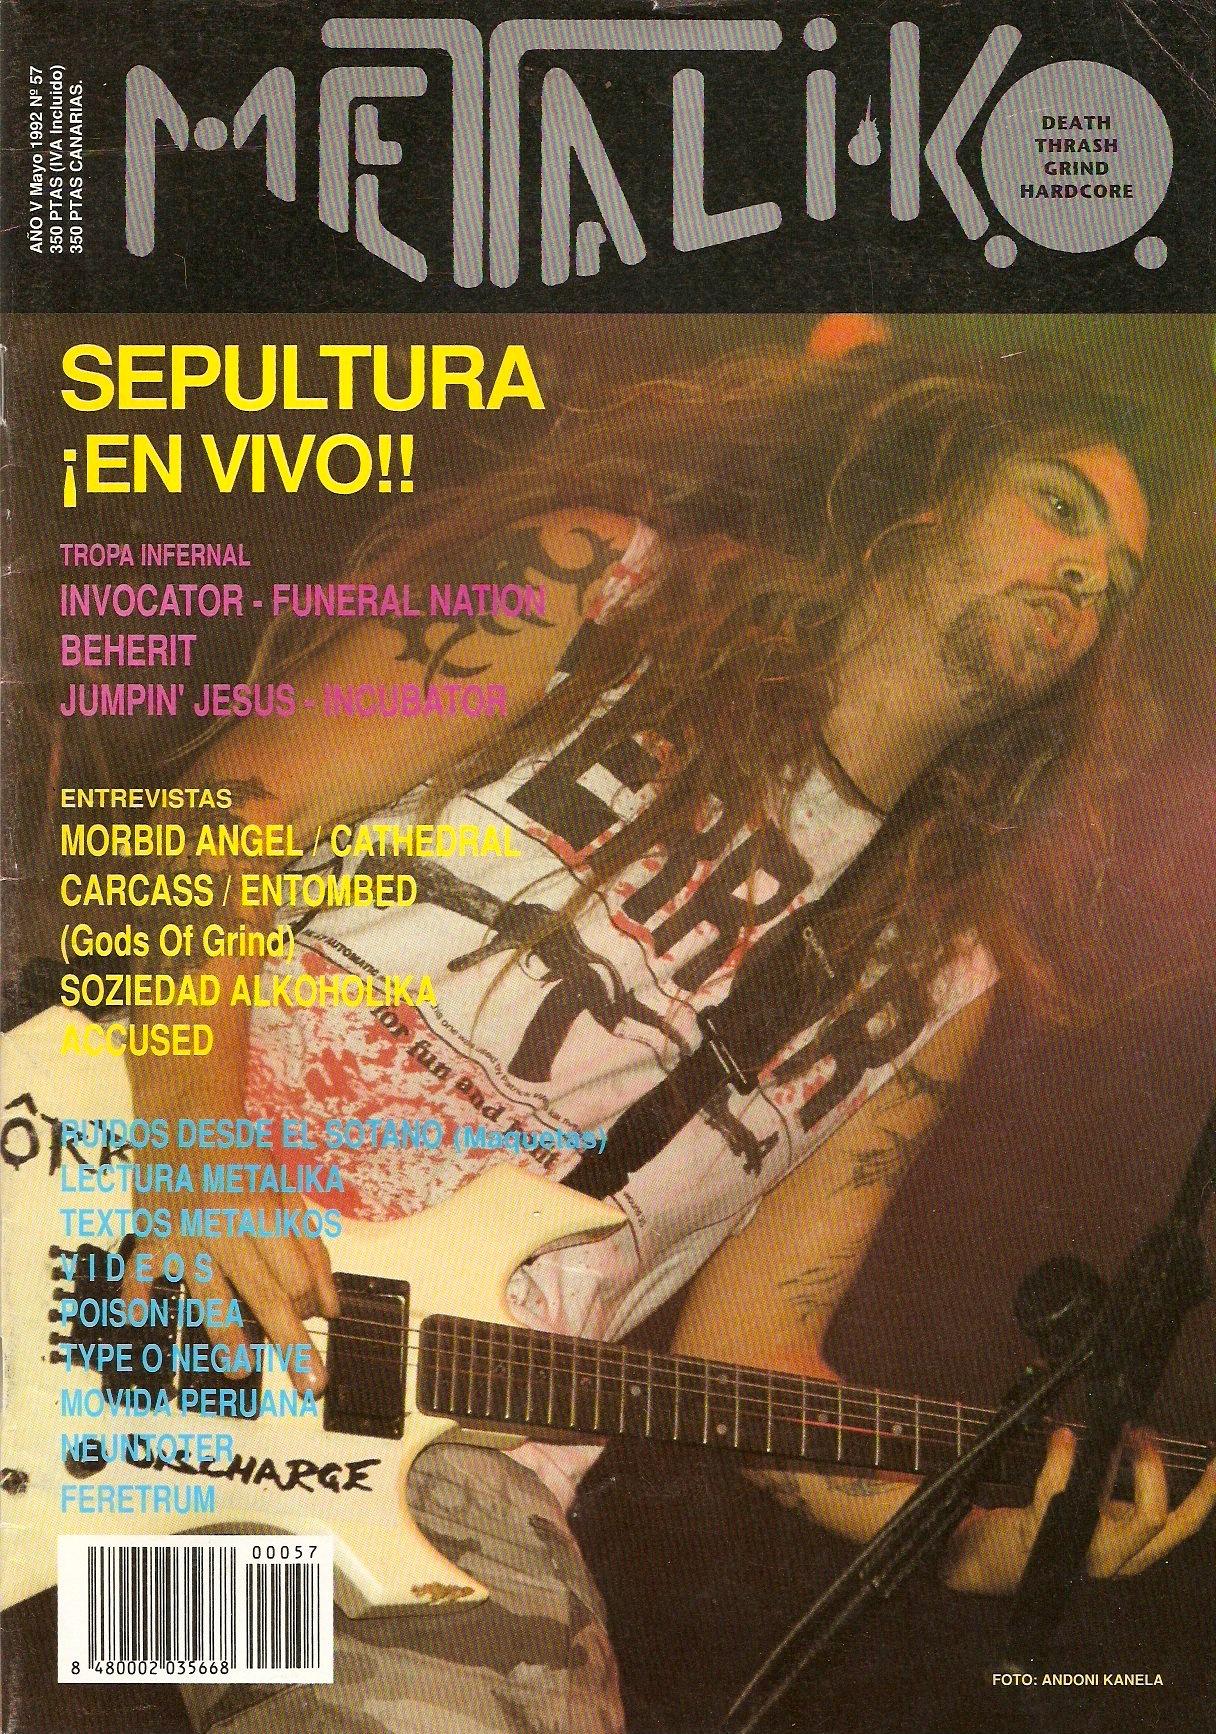 http://www.librometalextremo.com/blog/wp-content/uploads/2011/04/Imagen-escaneada.jpeg